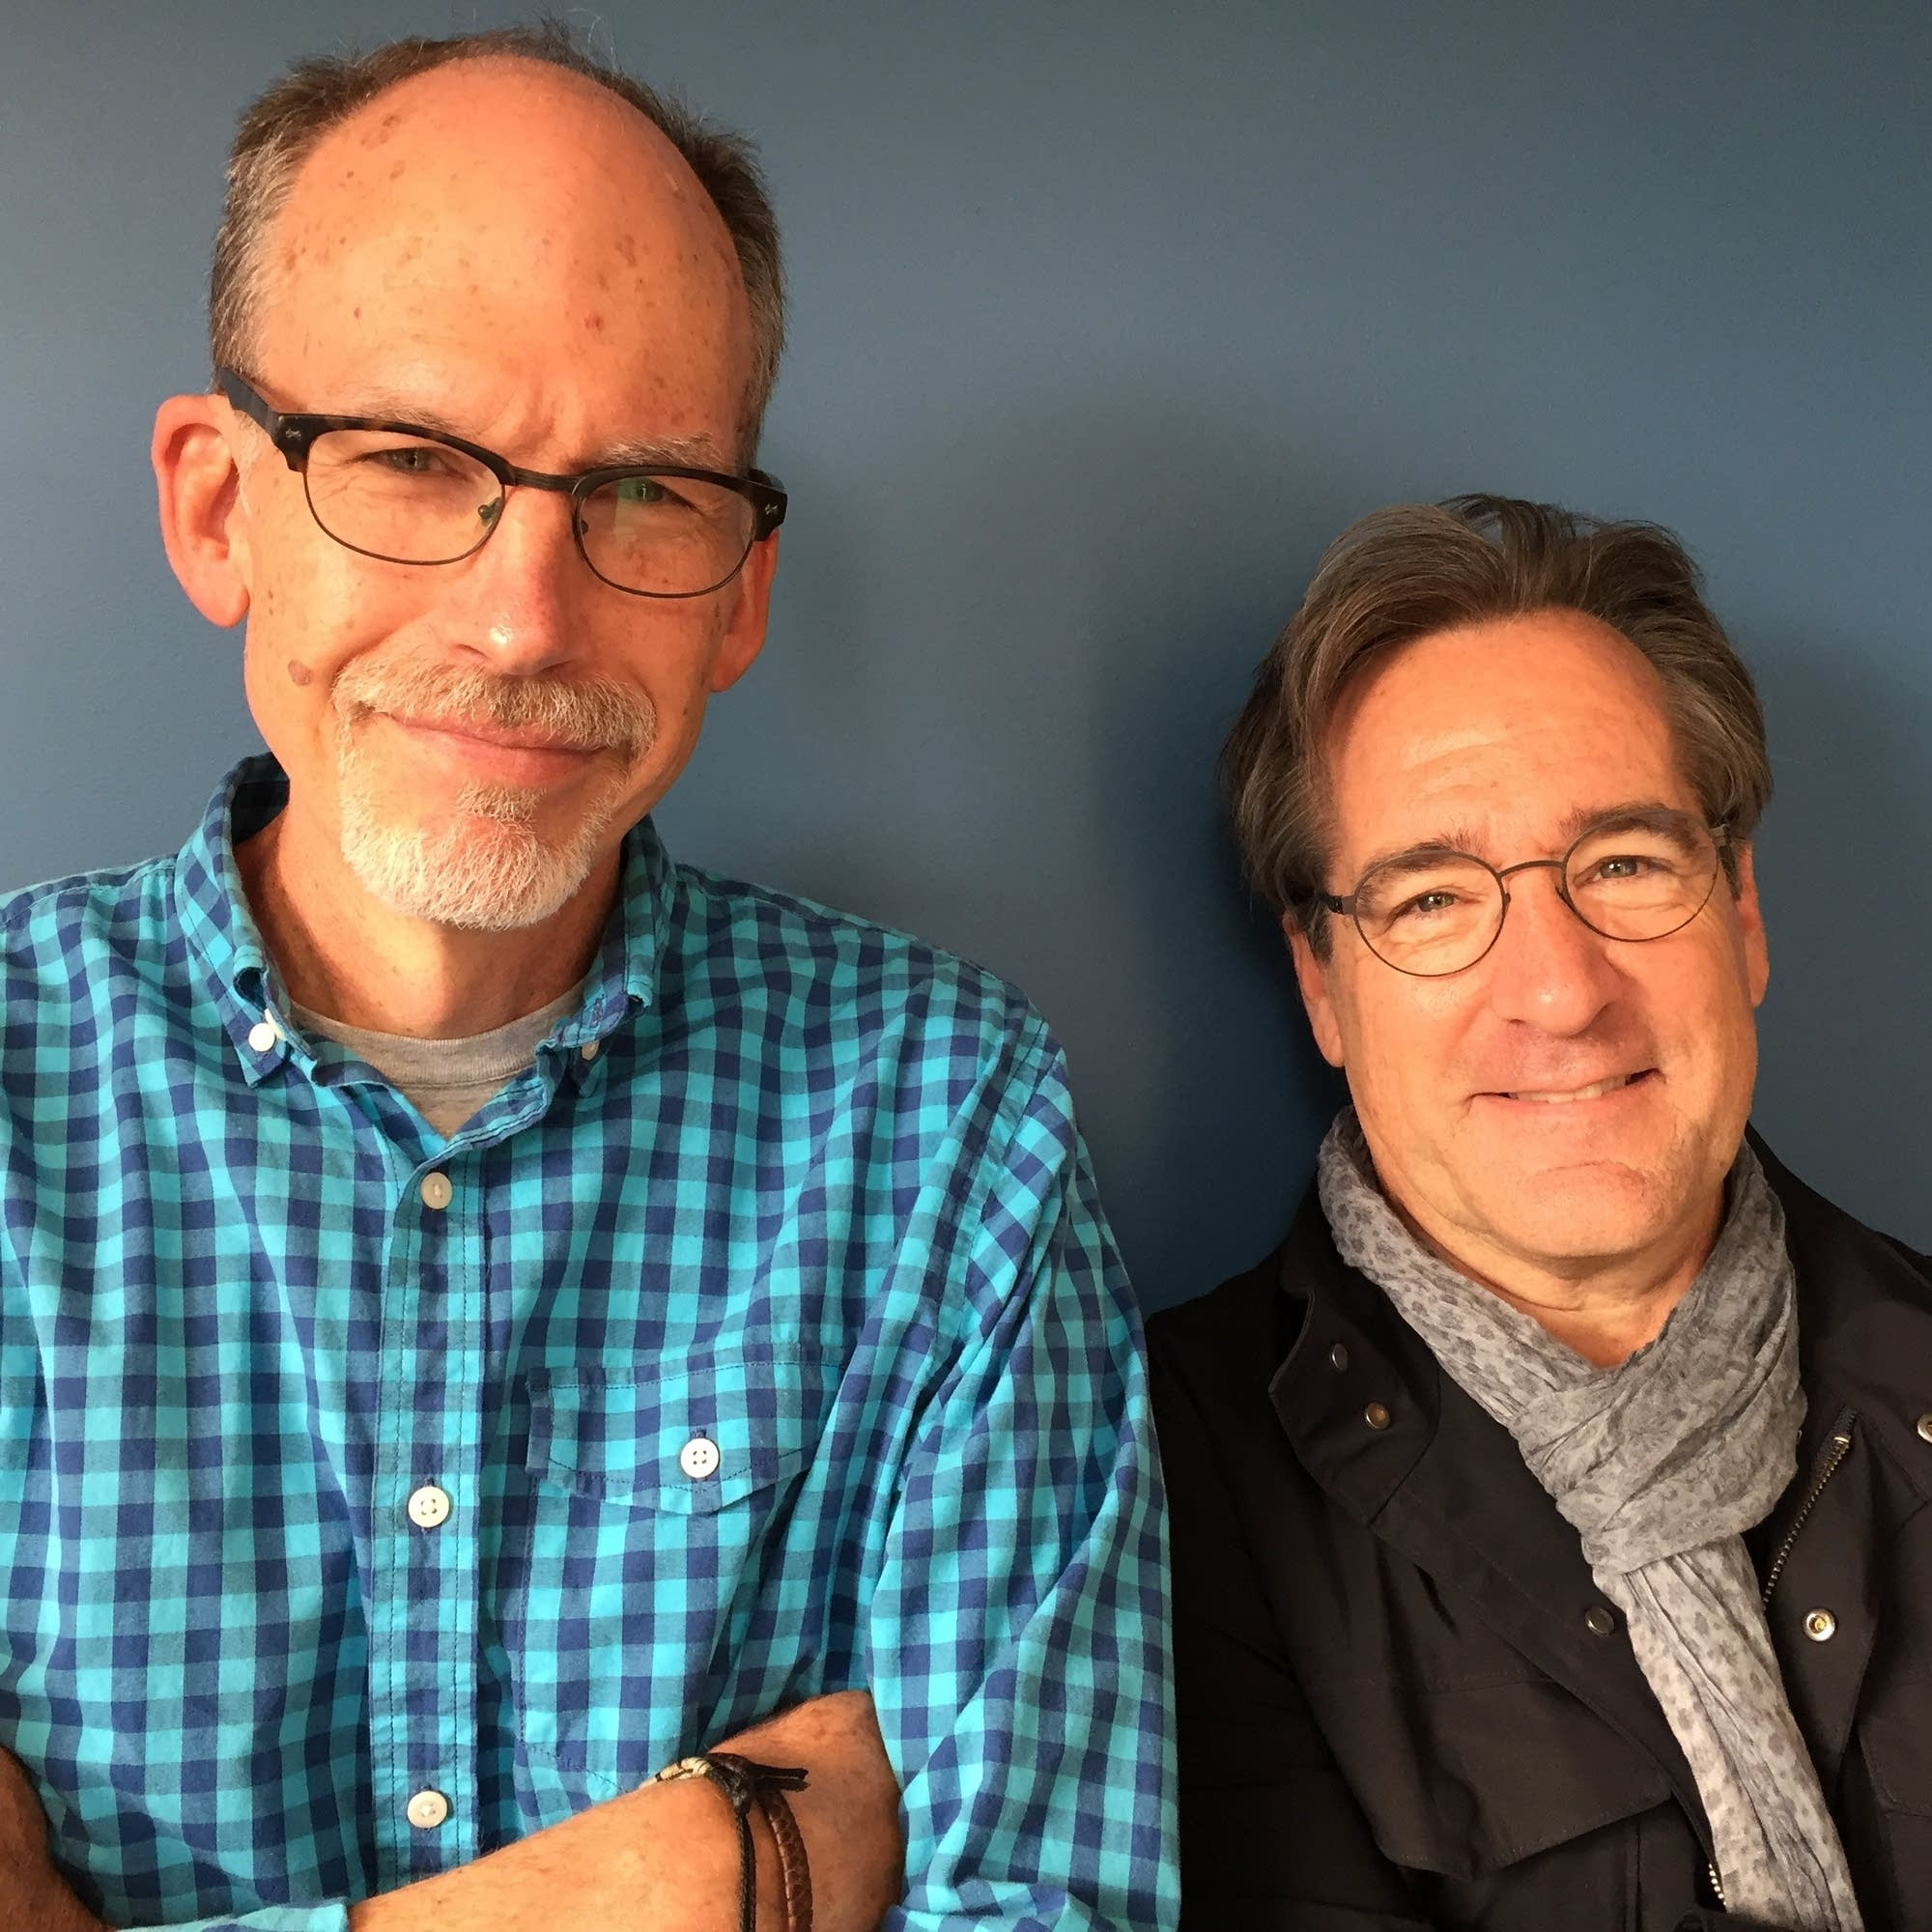 Mike Pengra and Richard Shindell